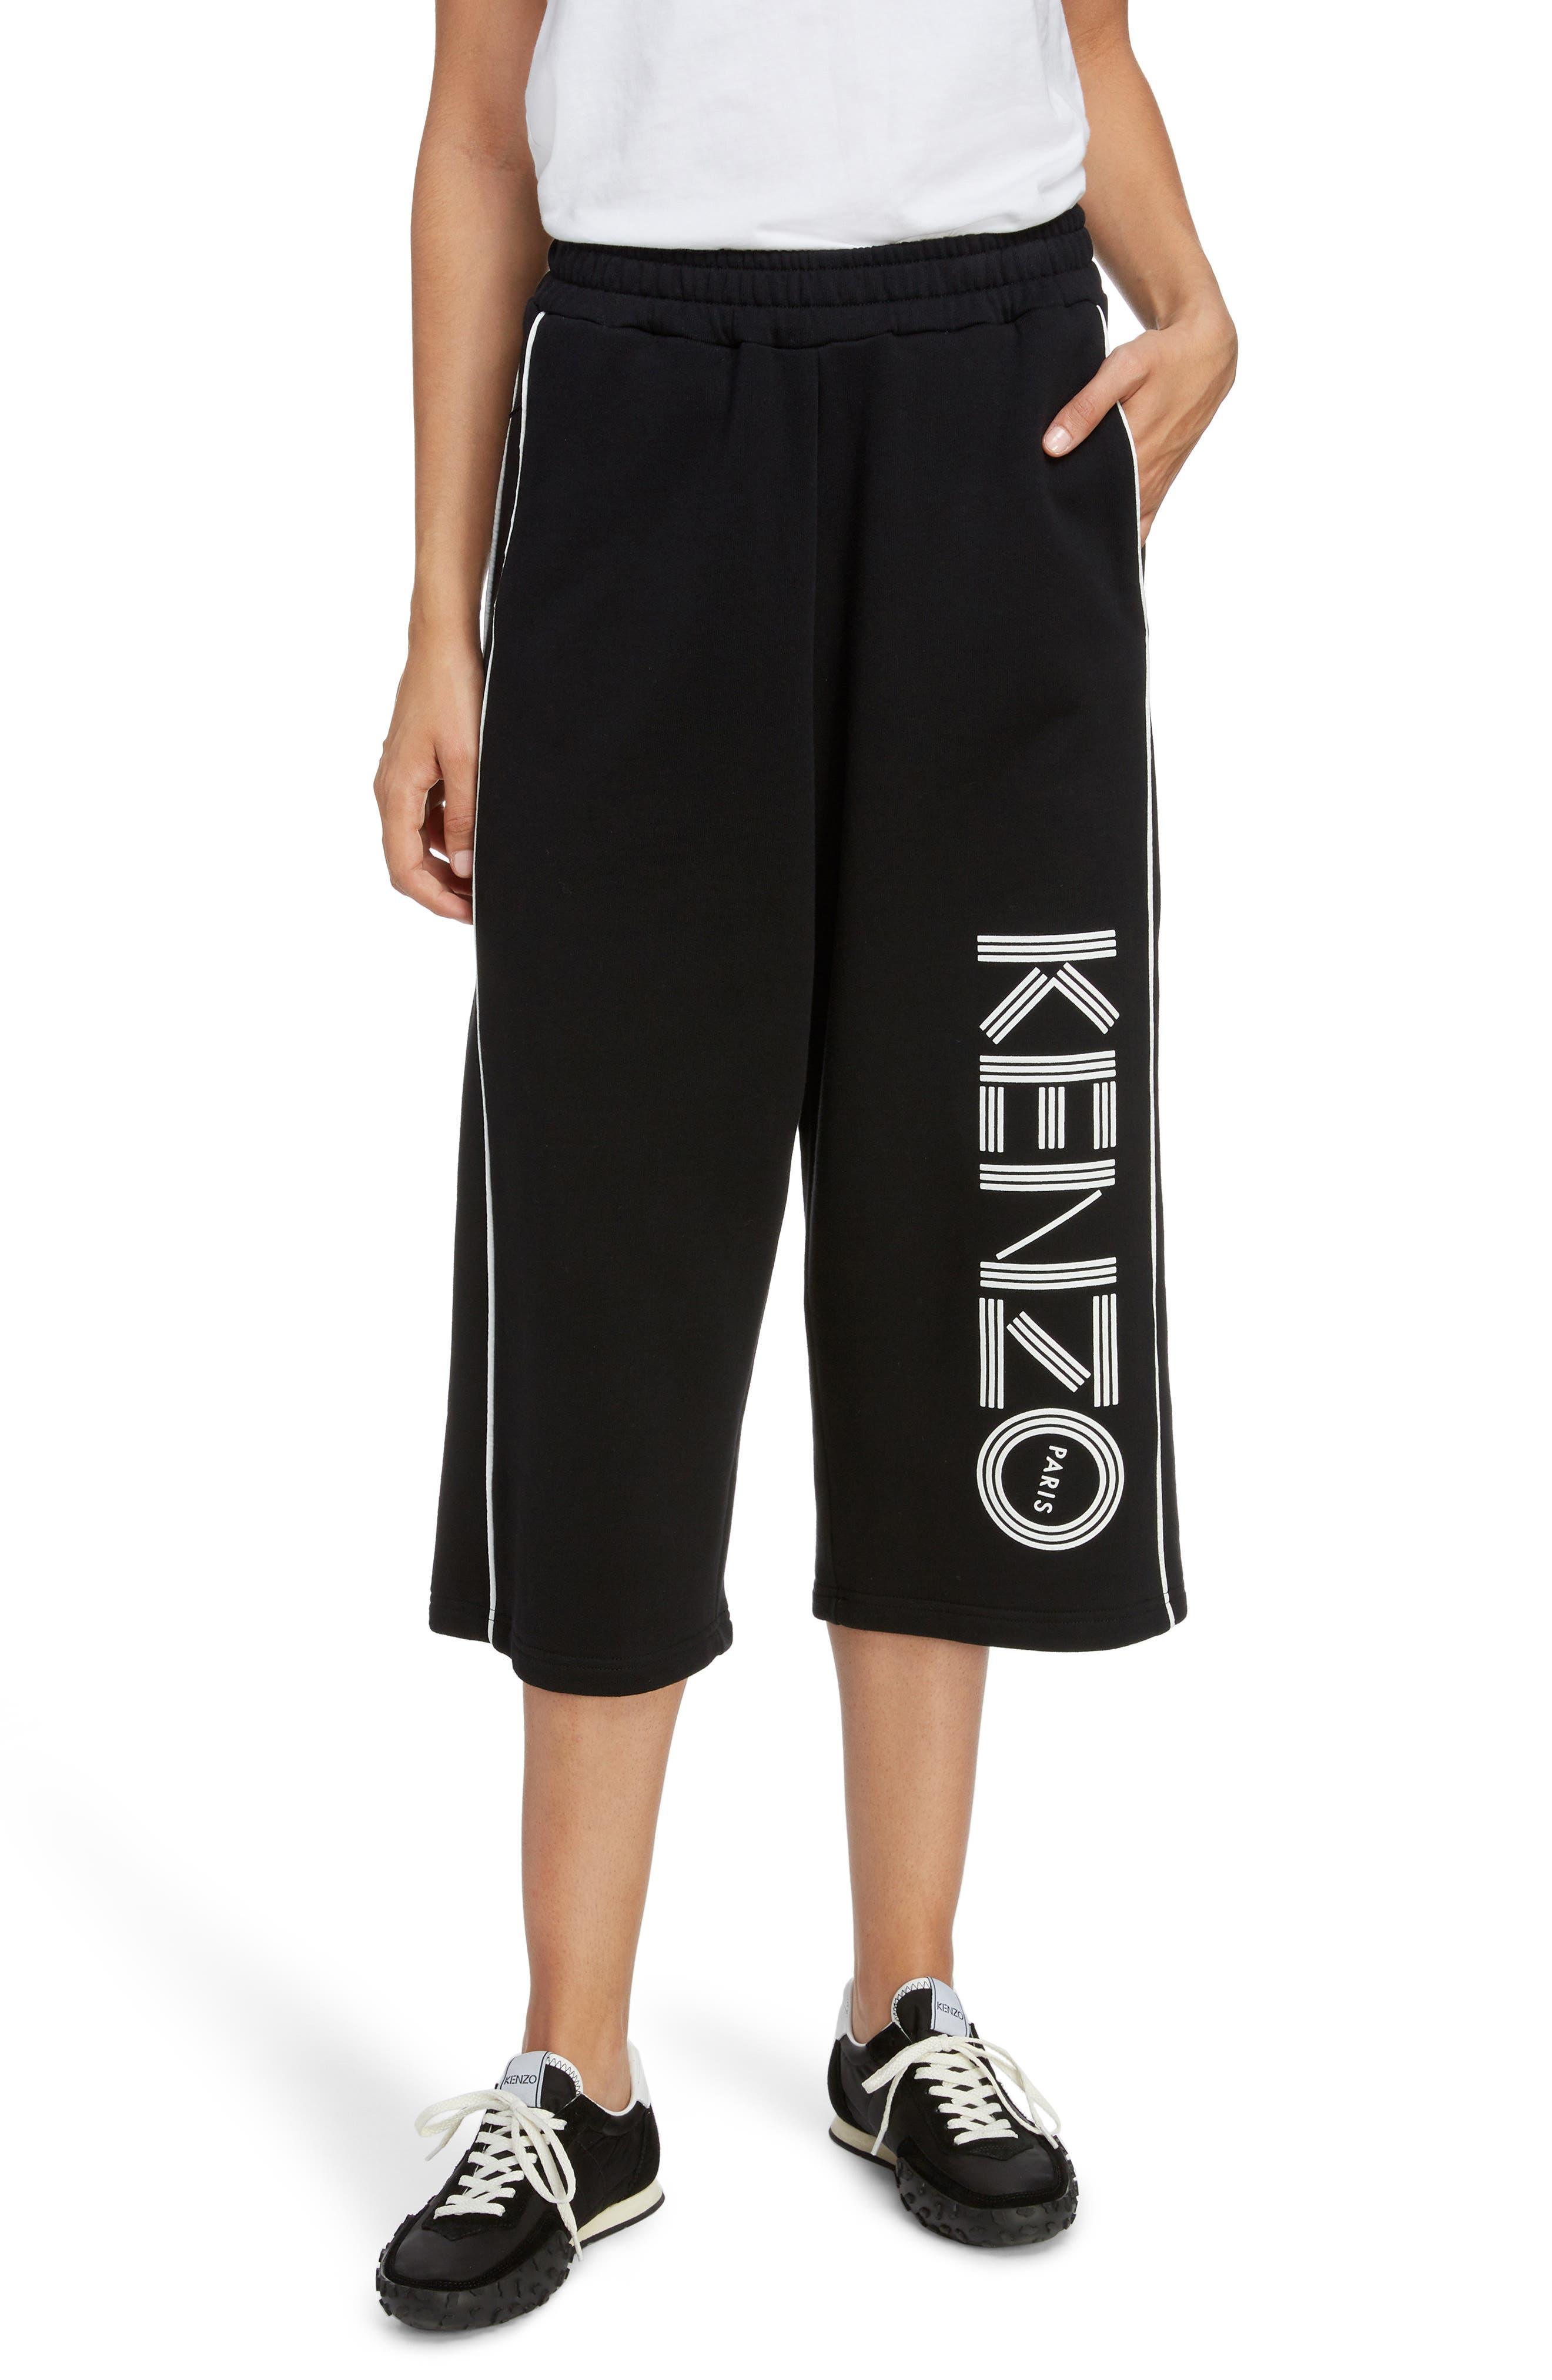 KENZO, Sport Culottes, Main thumbnail 1, color, BLACK